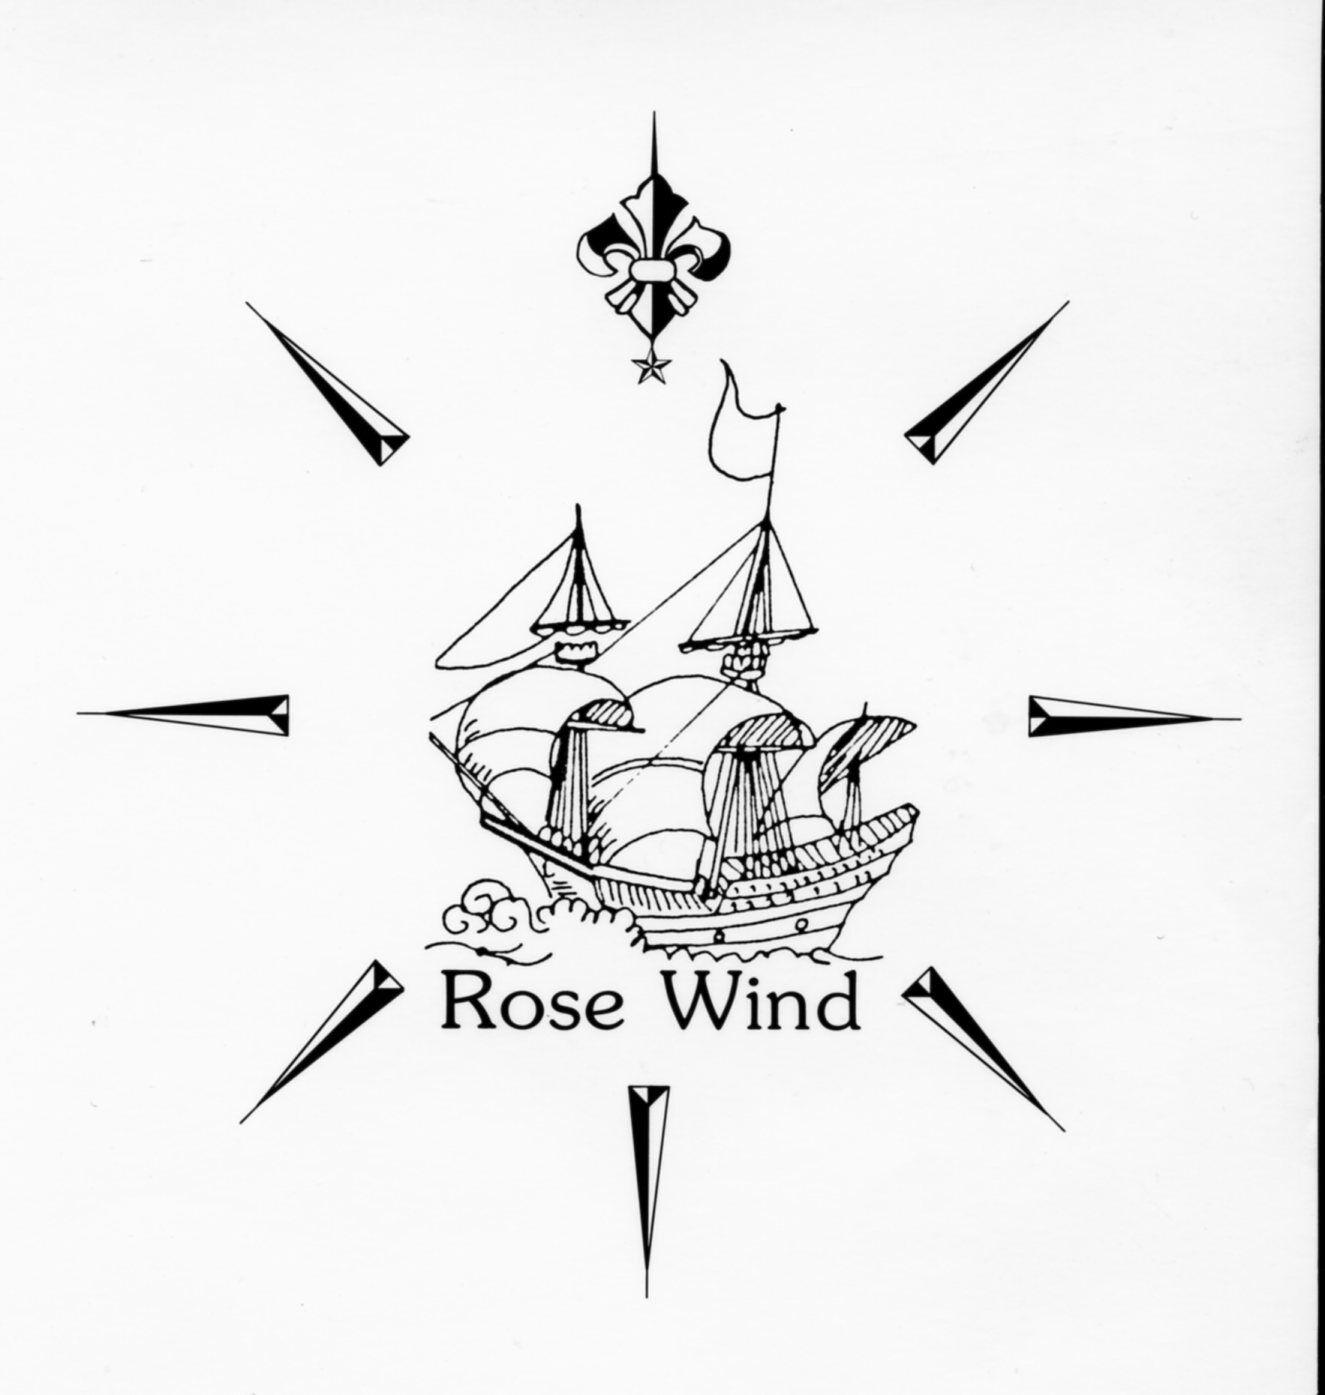 RoseWindArt from Around the World